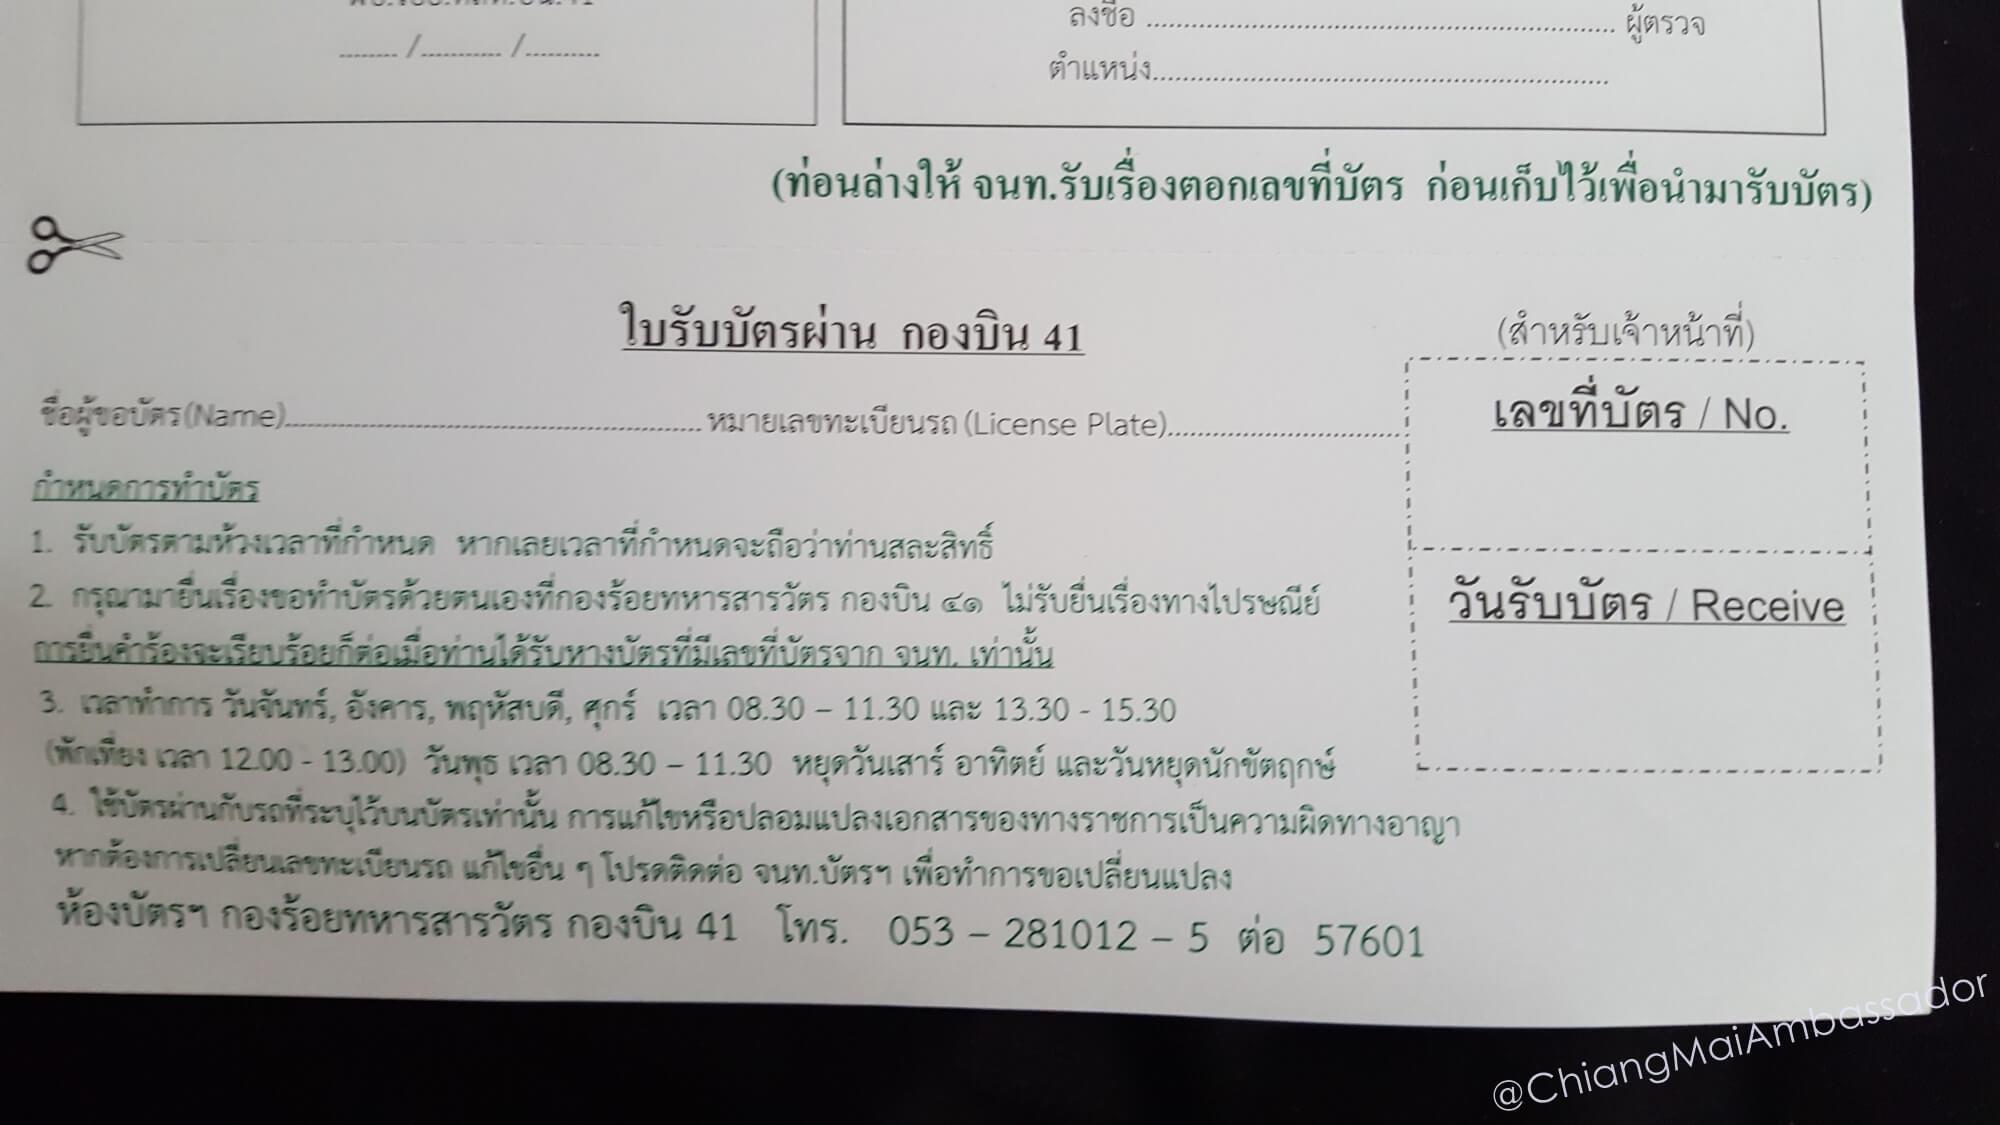 Chiang Mai Ambassador Wing 41 Pass Form 2